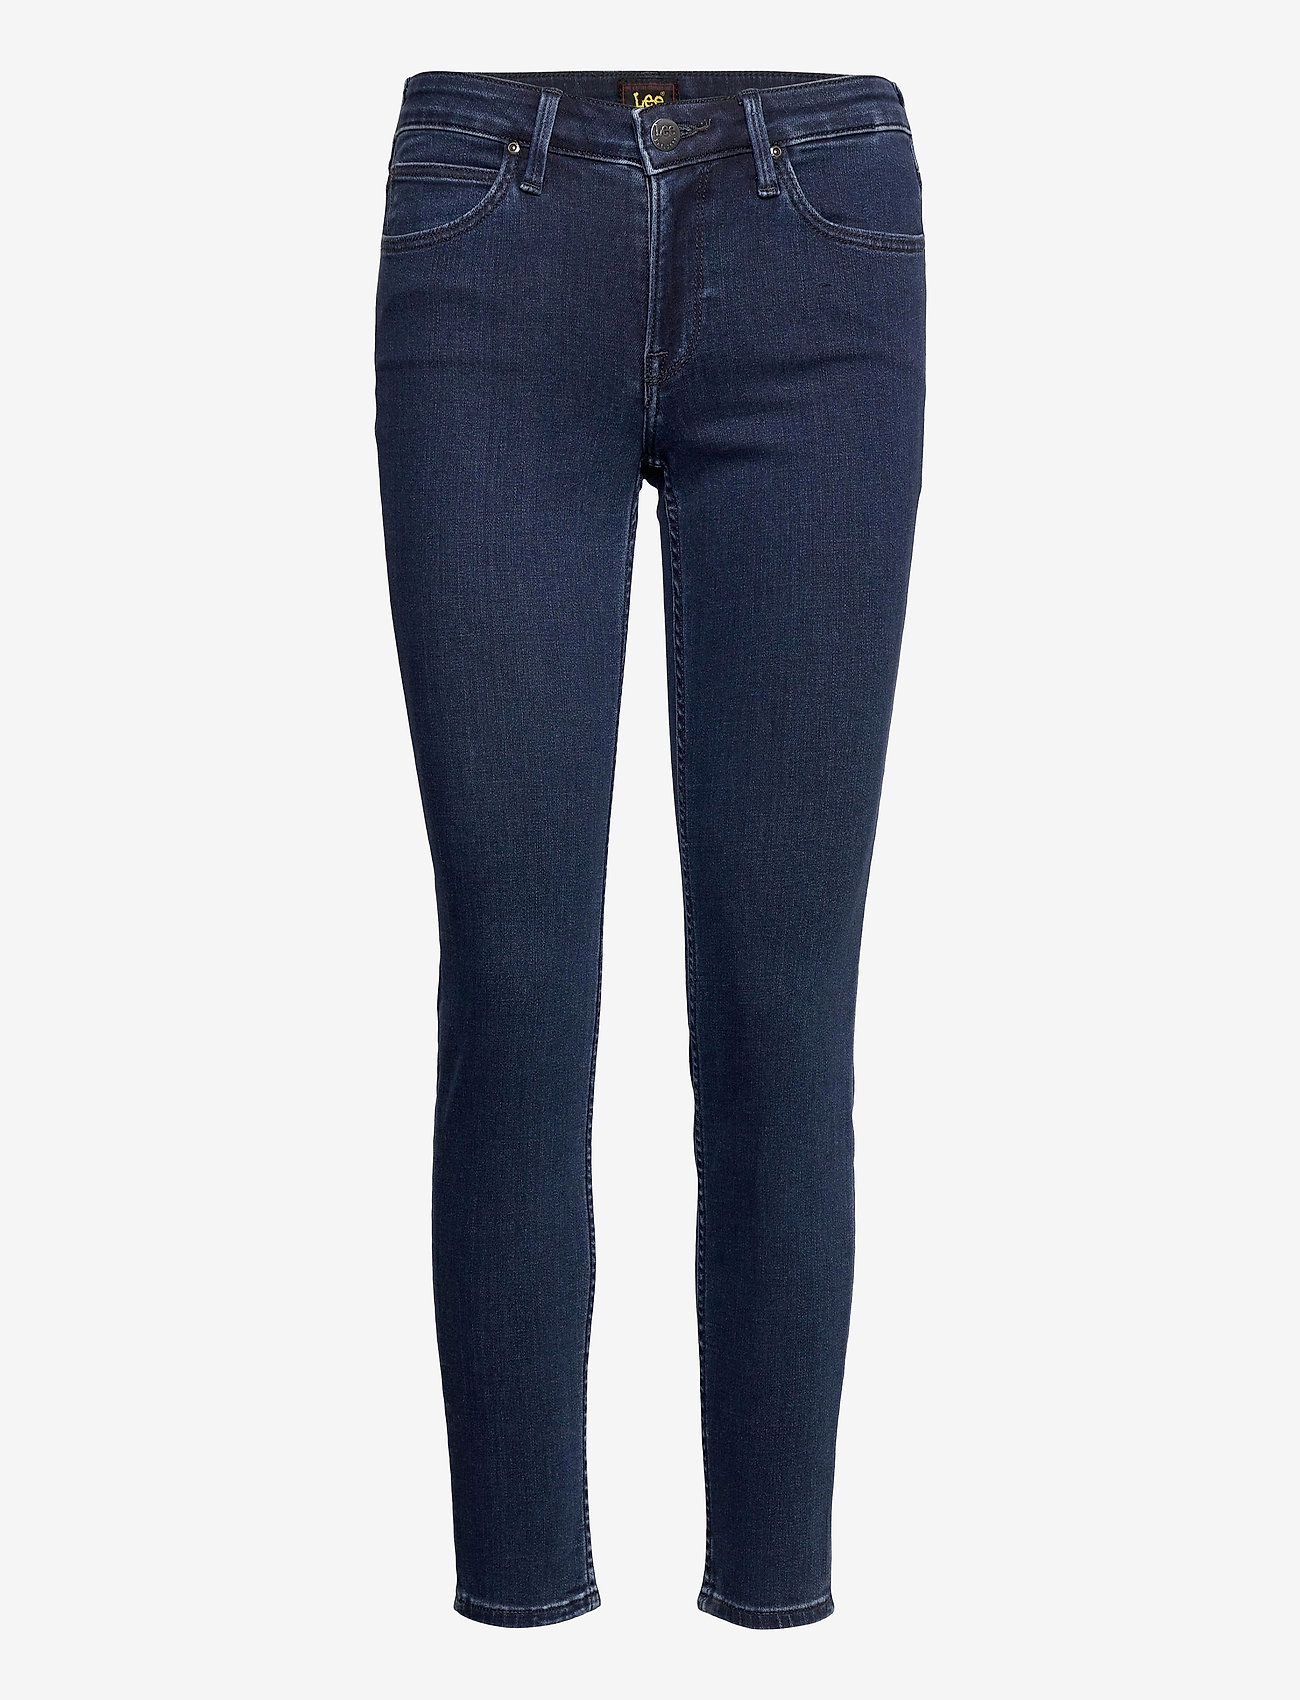 Lee Jeans - SCARLETT - skinny jeans - dark joni - 0